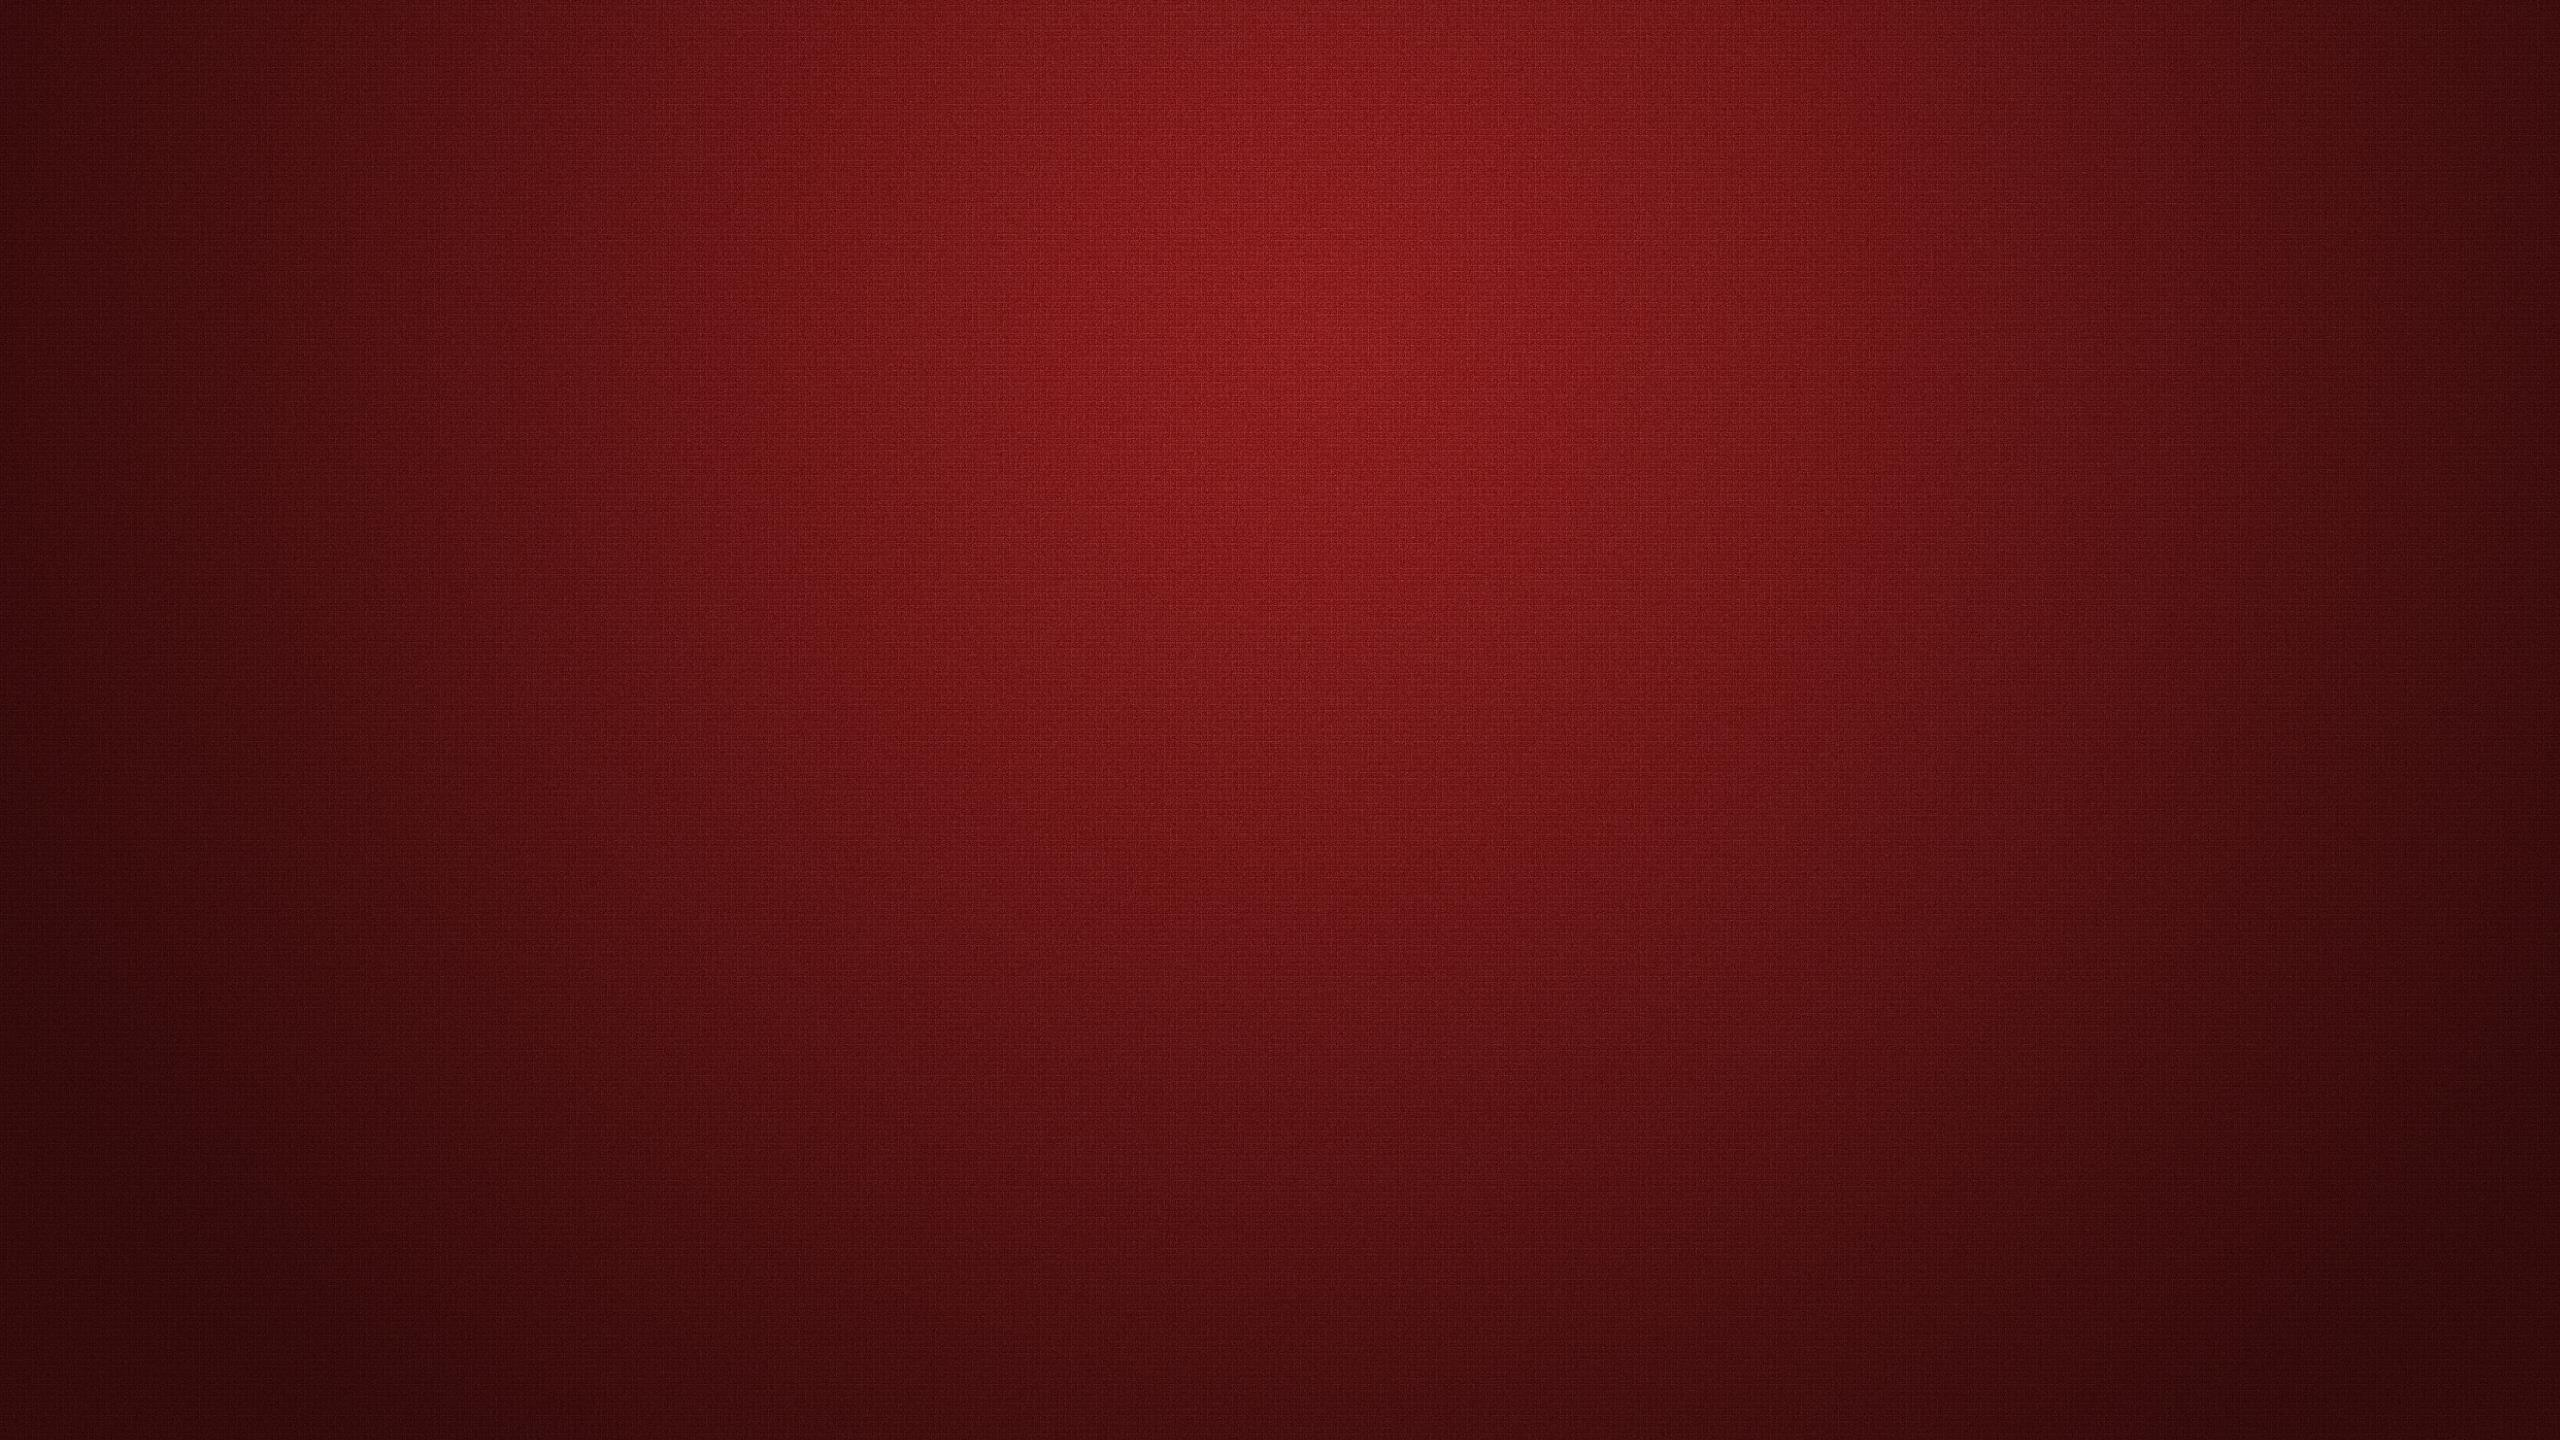 73 Dark Red Backgrounds On Wallpapersafari